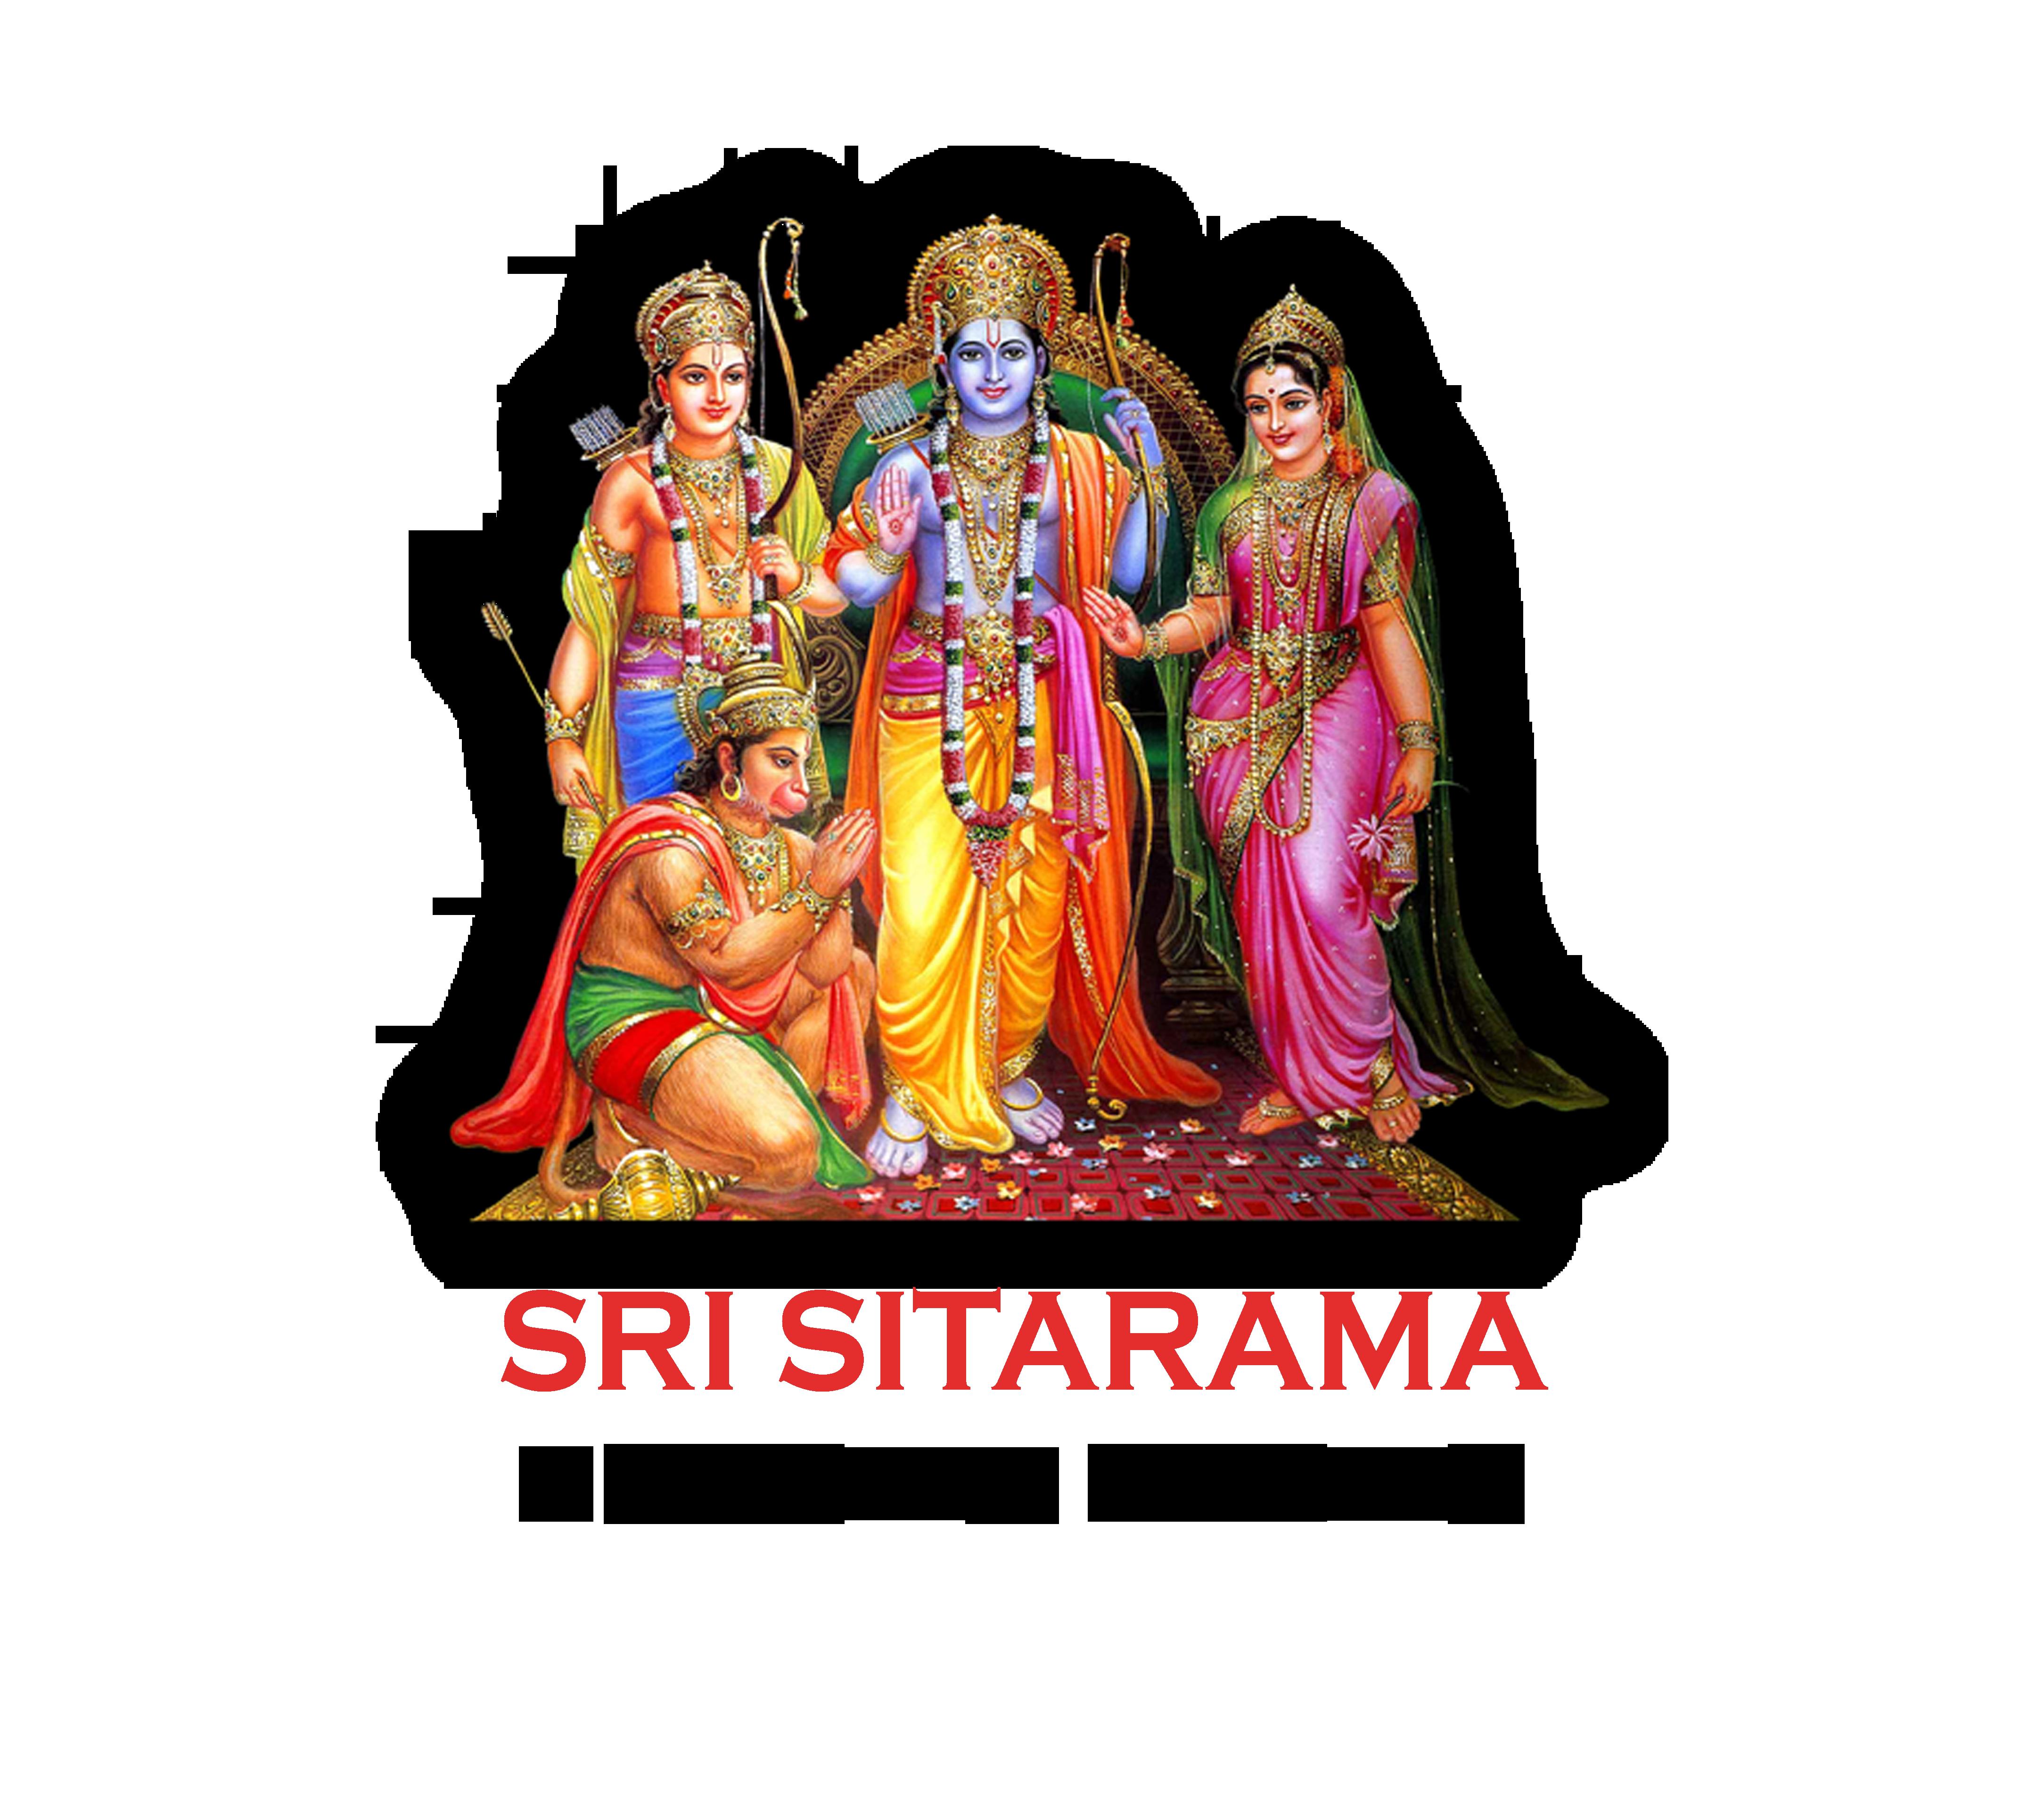 Sri Sita Rama General Stores